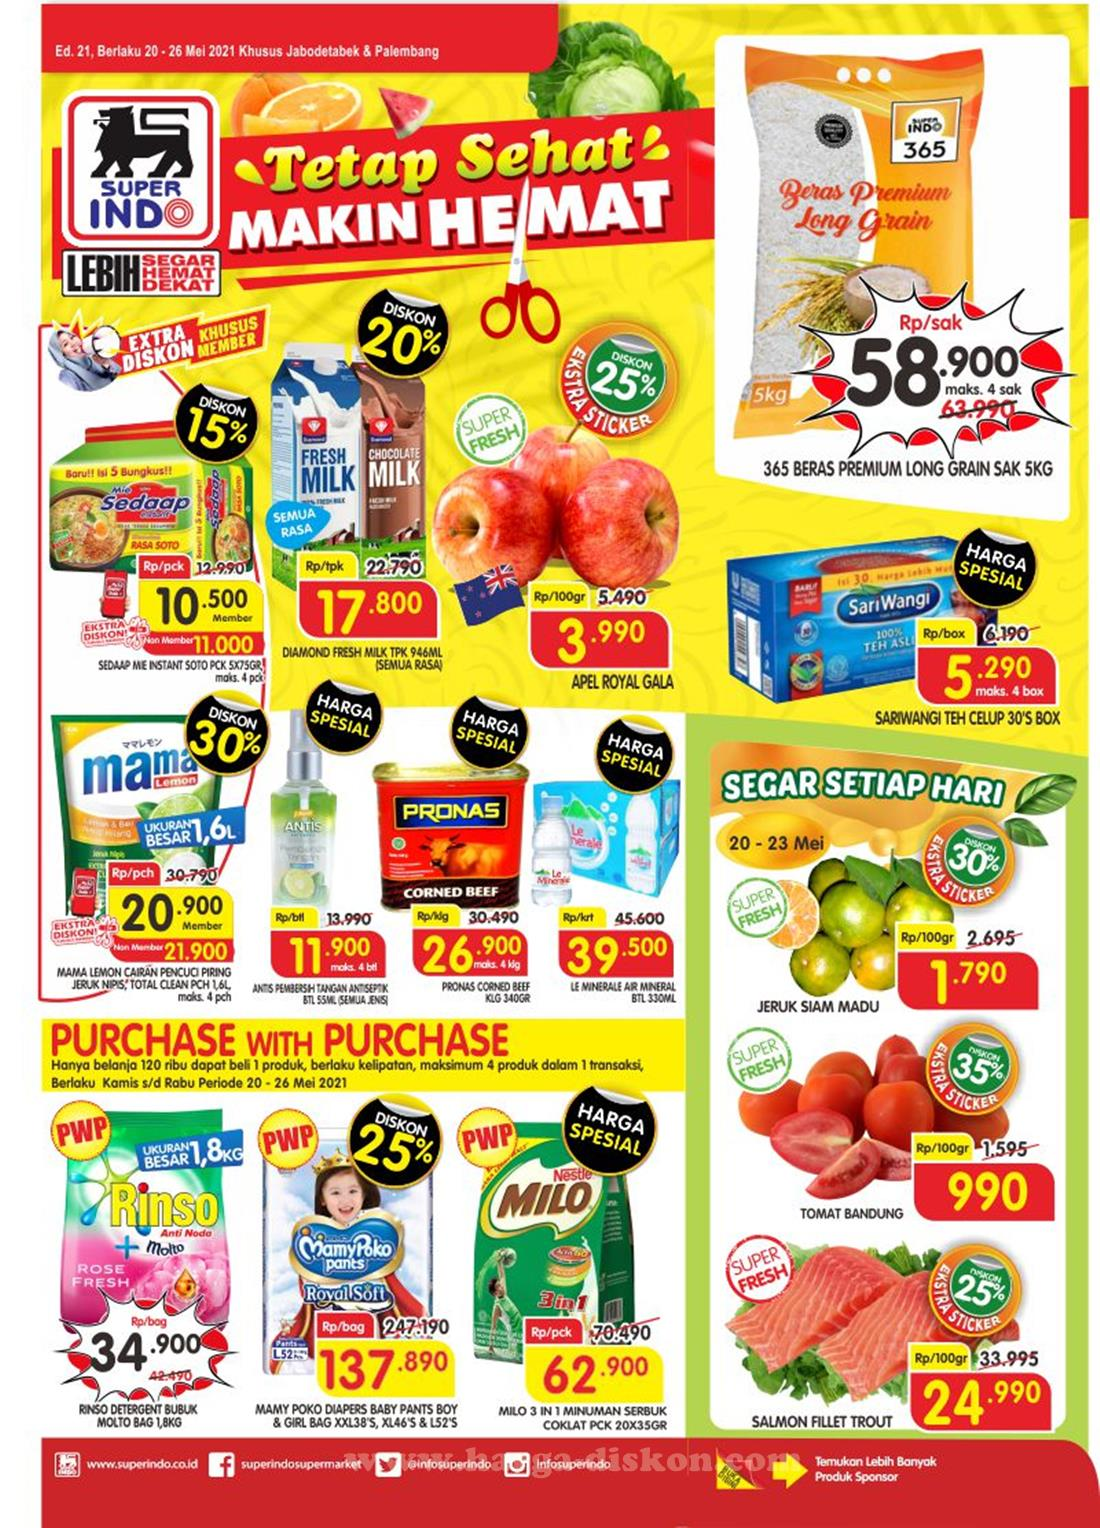 Katalog Superindo Promo Superindo Mingguan 20 - 26 Mei 2021